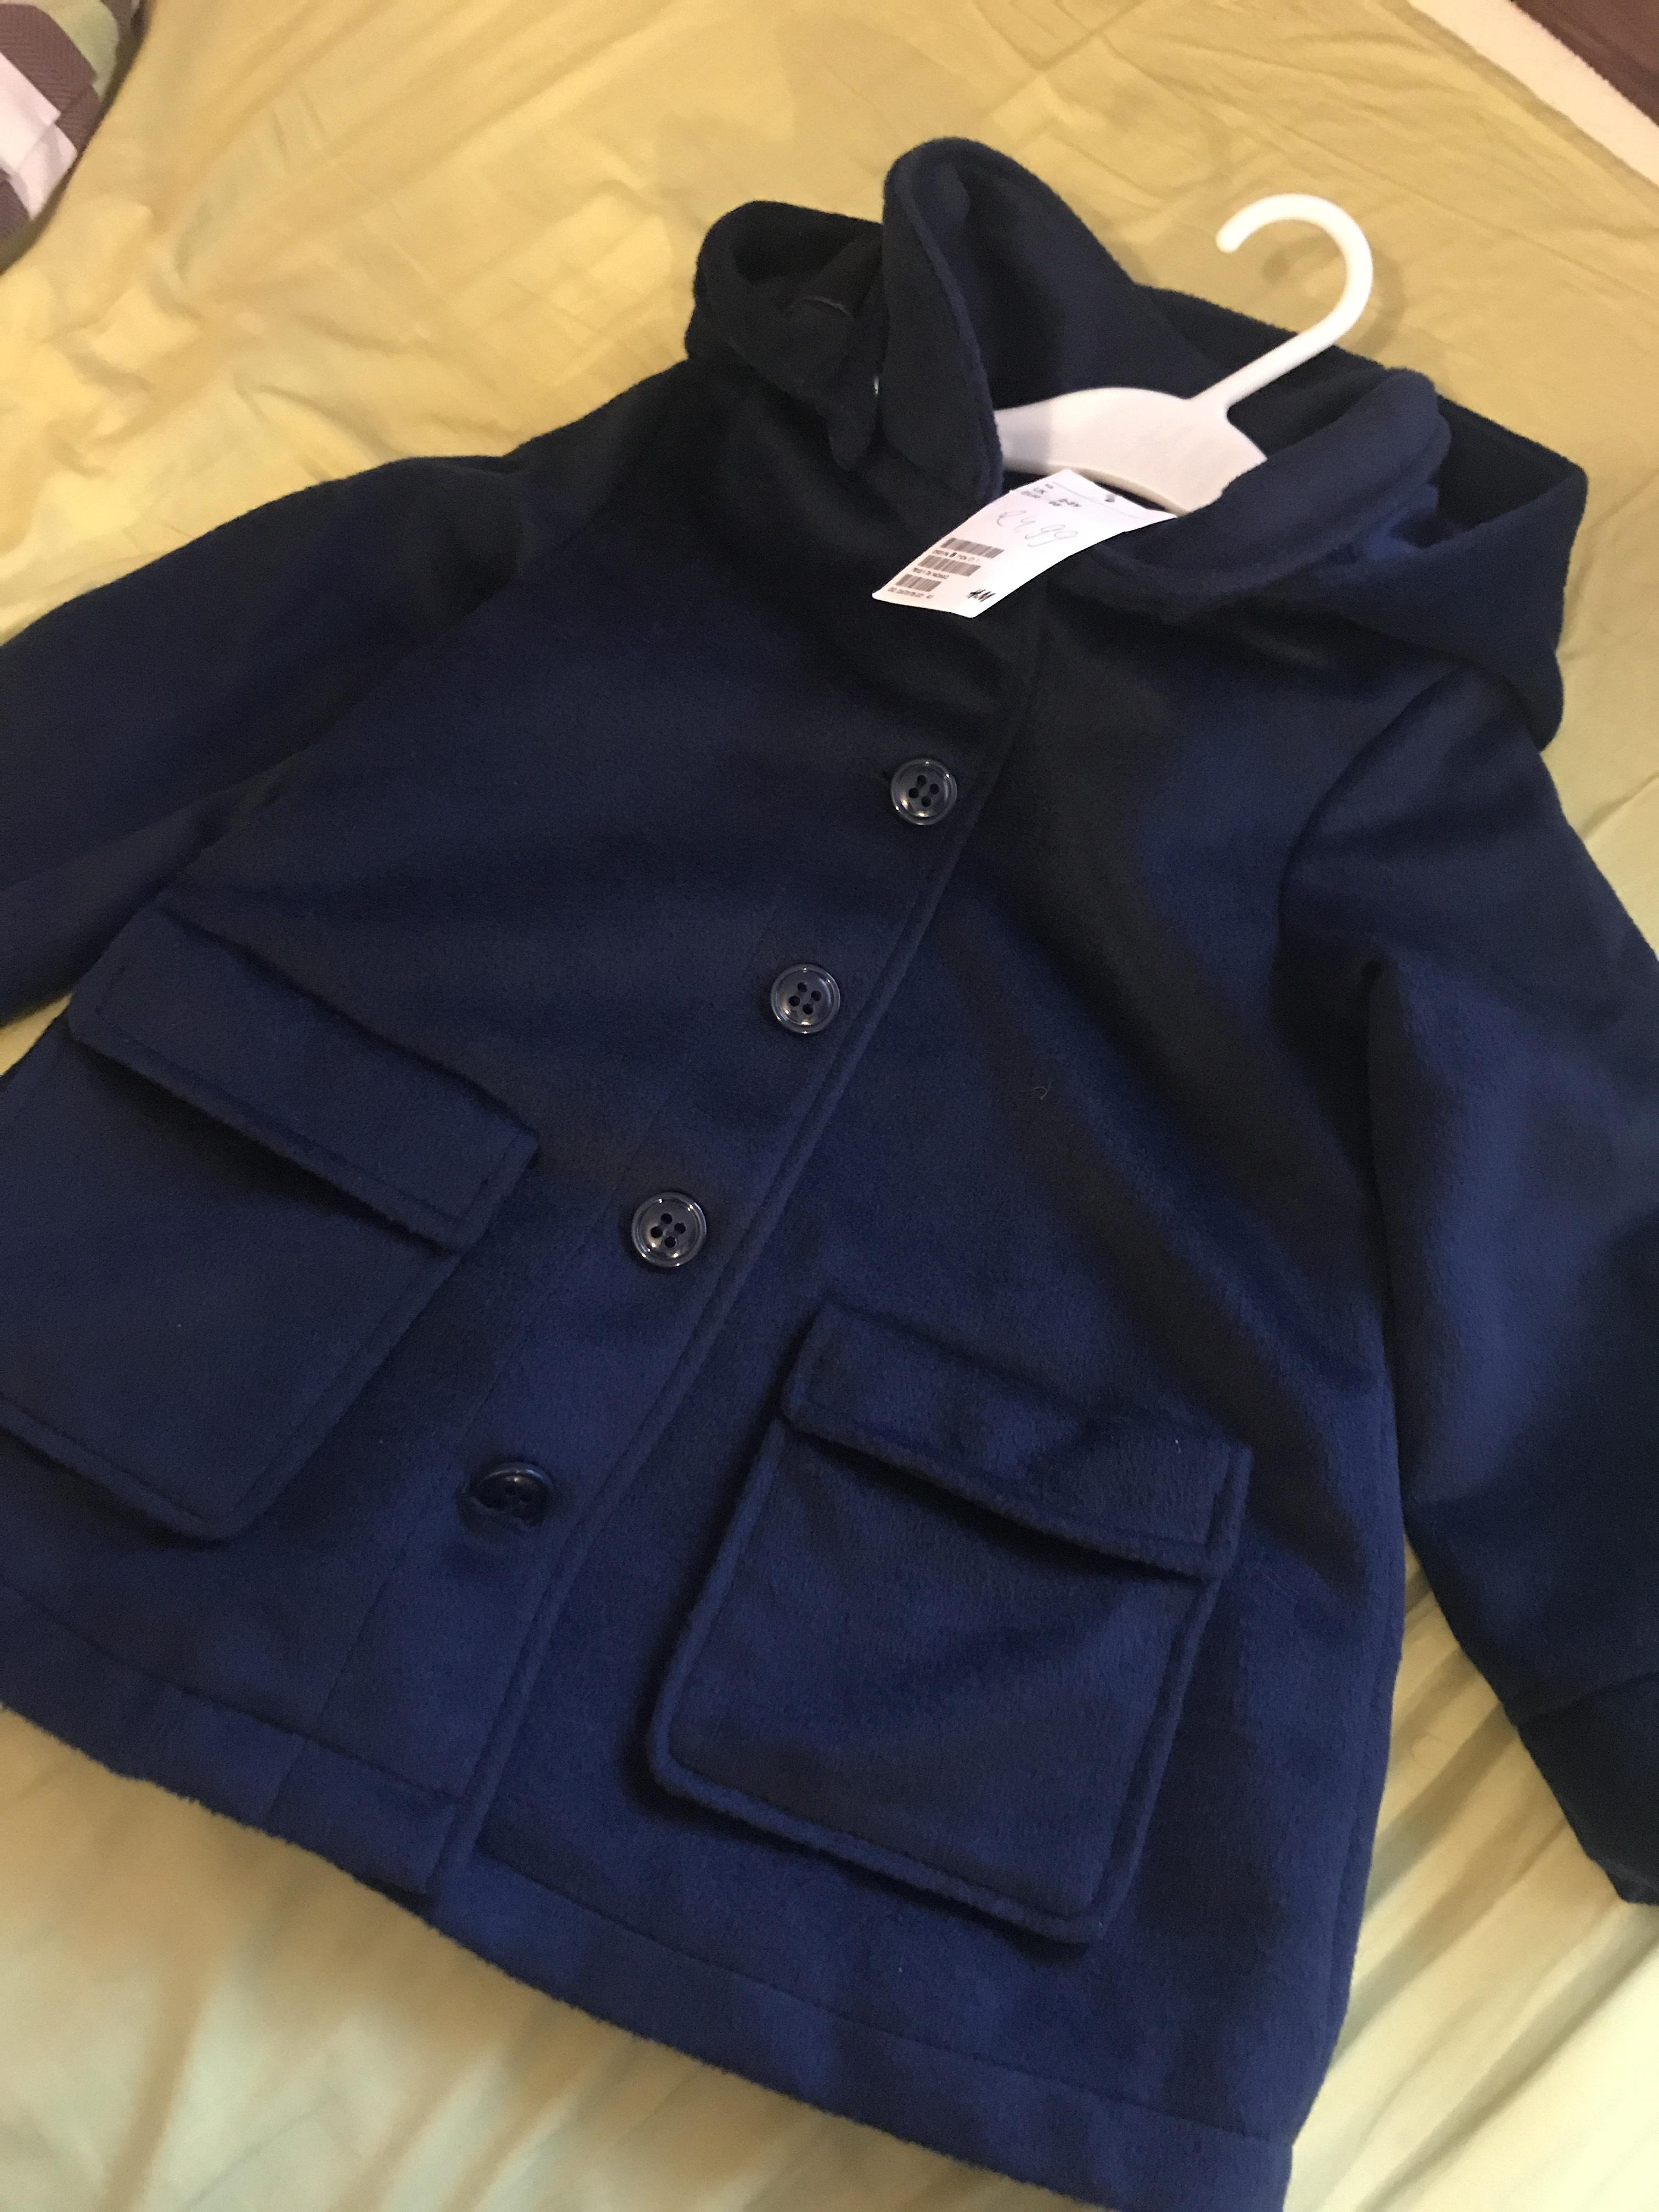 Girls blue coat £8.50  from H&M - Westfield Stratford